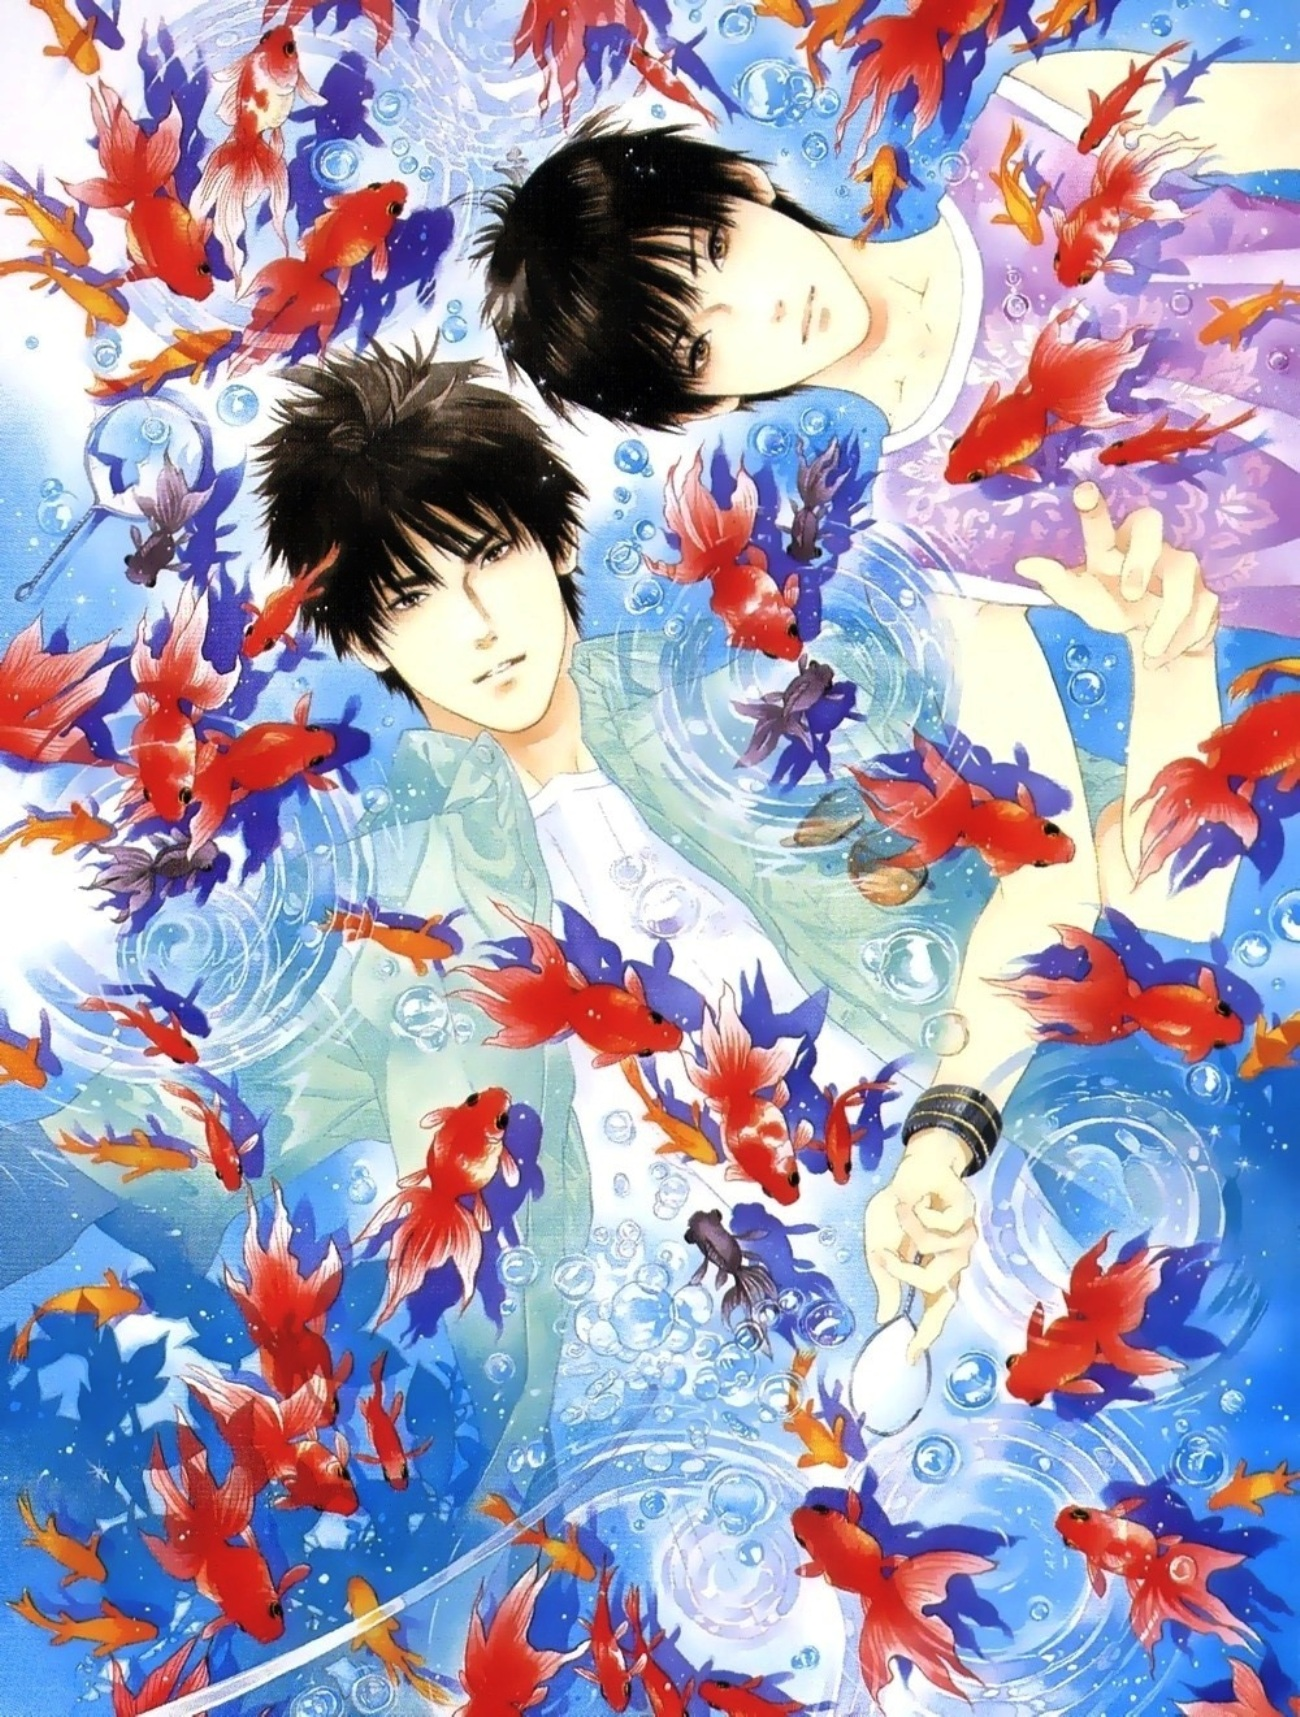 Ayumi kasai image 103545 zerochan anime image board for Onmyoudou